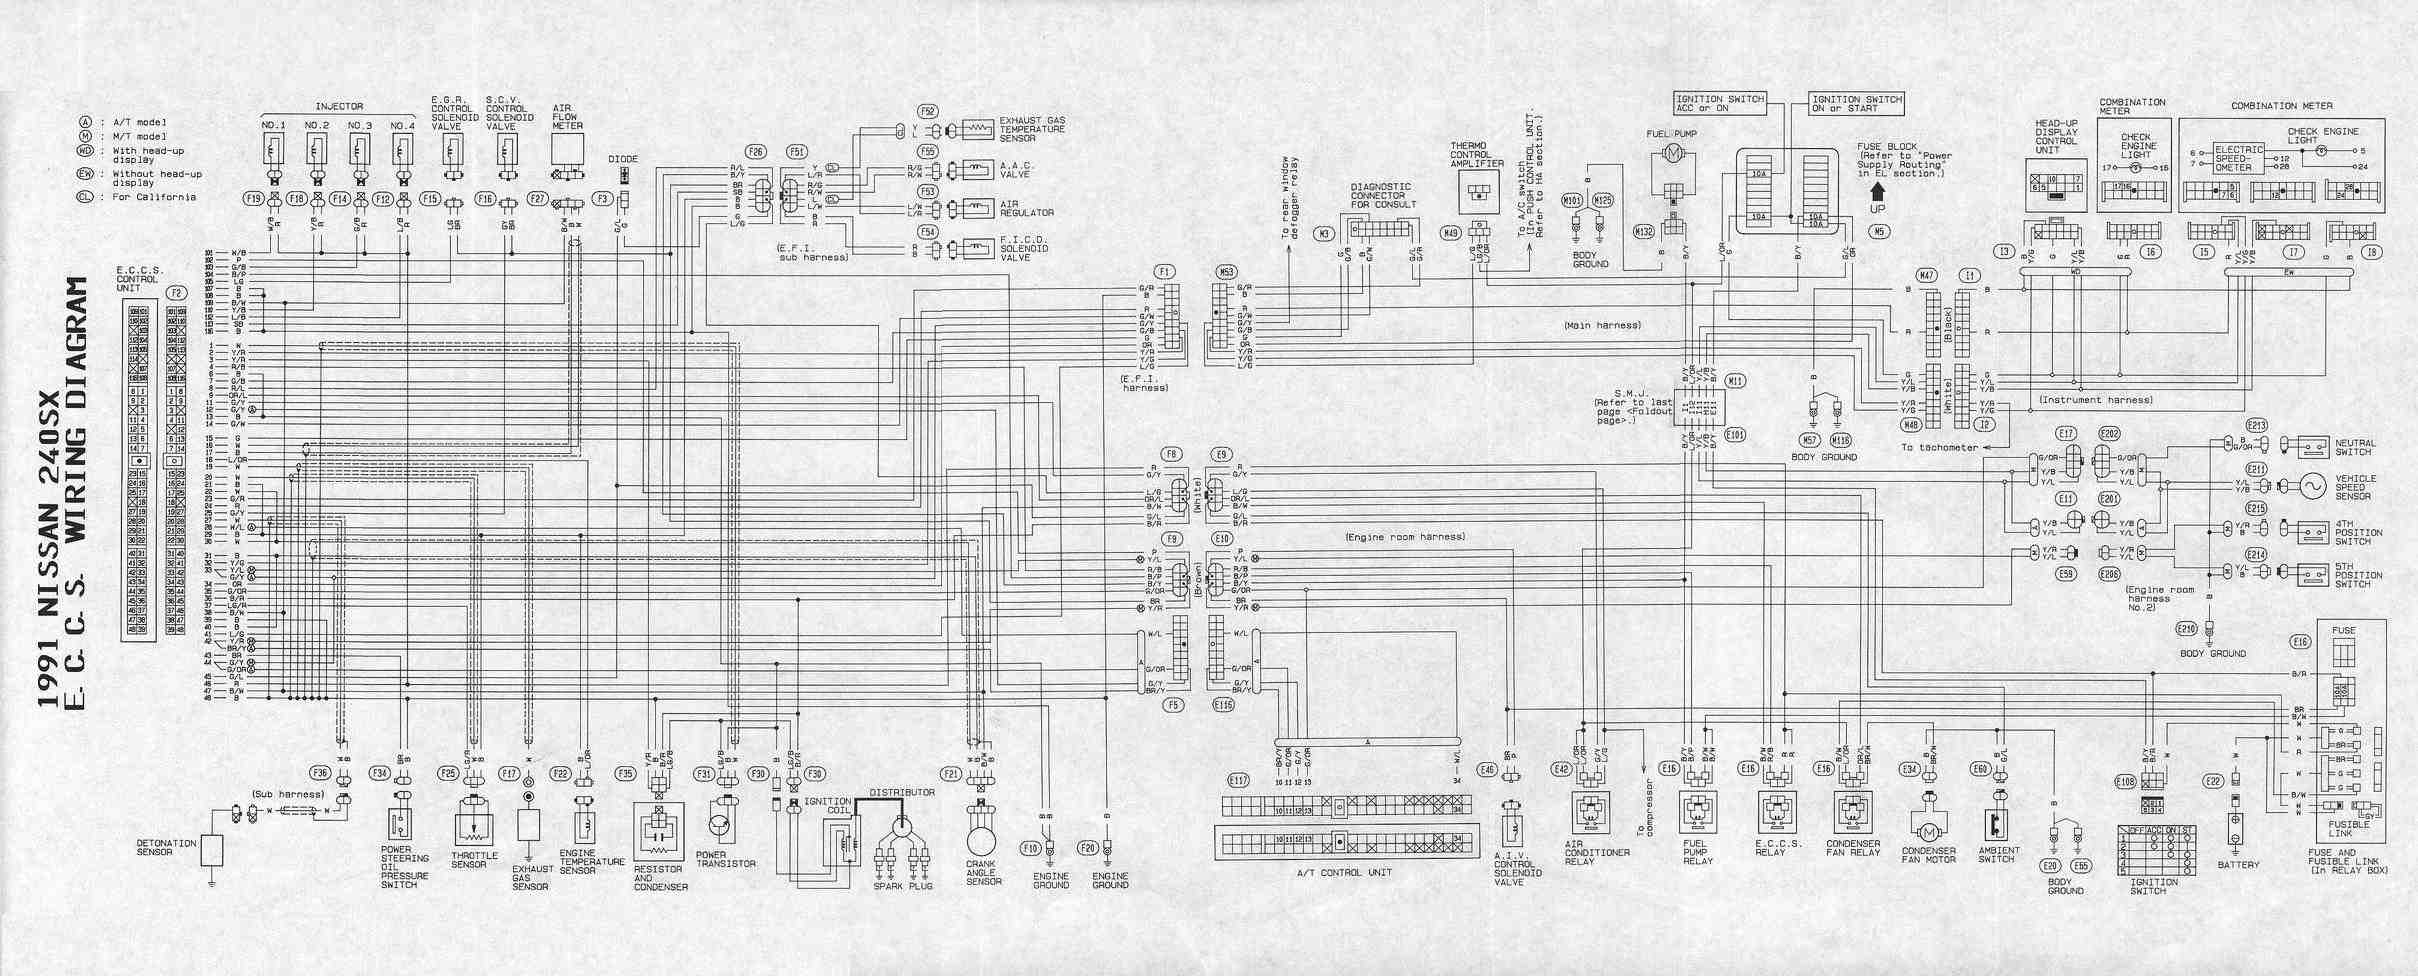 small resolution of nissan ka24e wiring diagram wiring diagram schematics source rb20det wiring diagram pdf free u2022 oasis